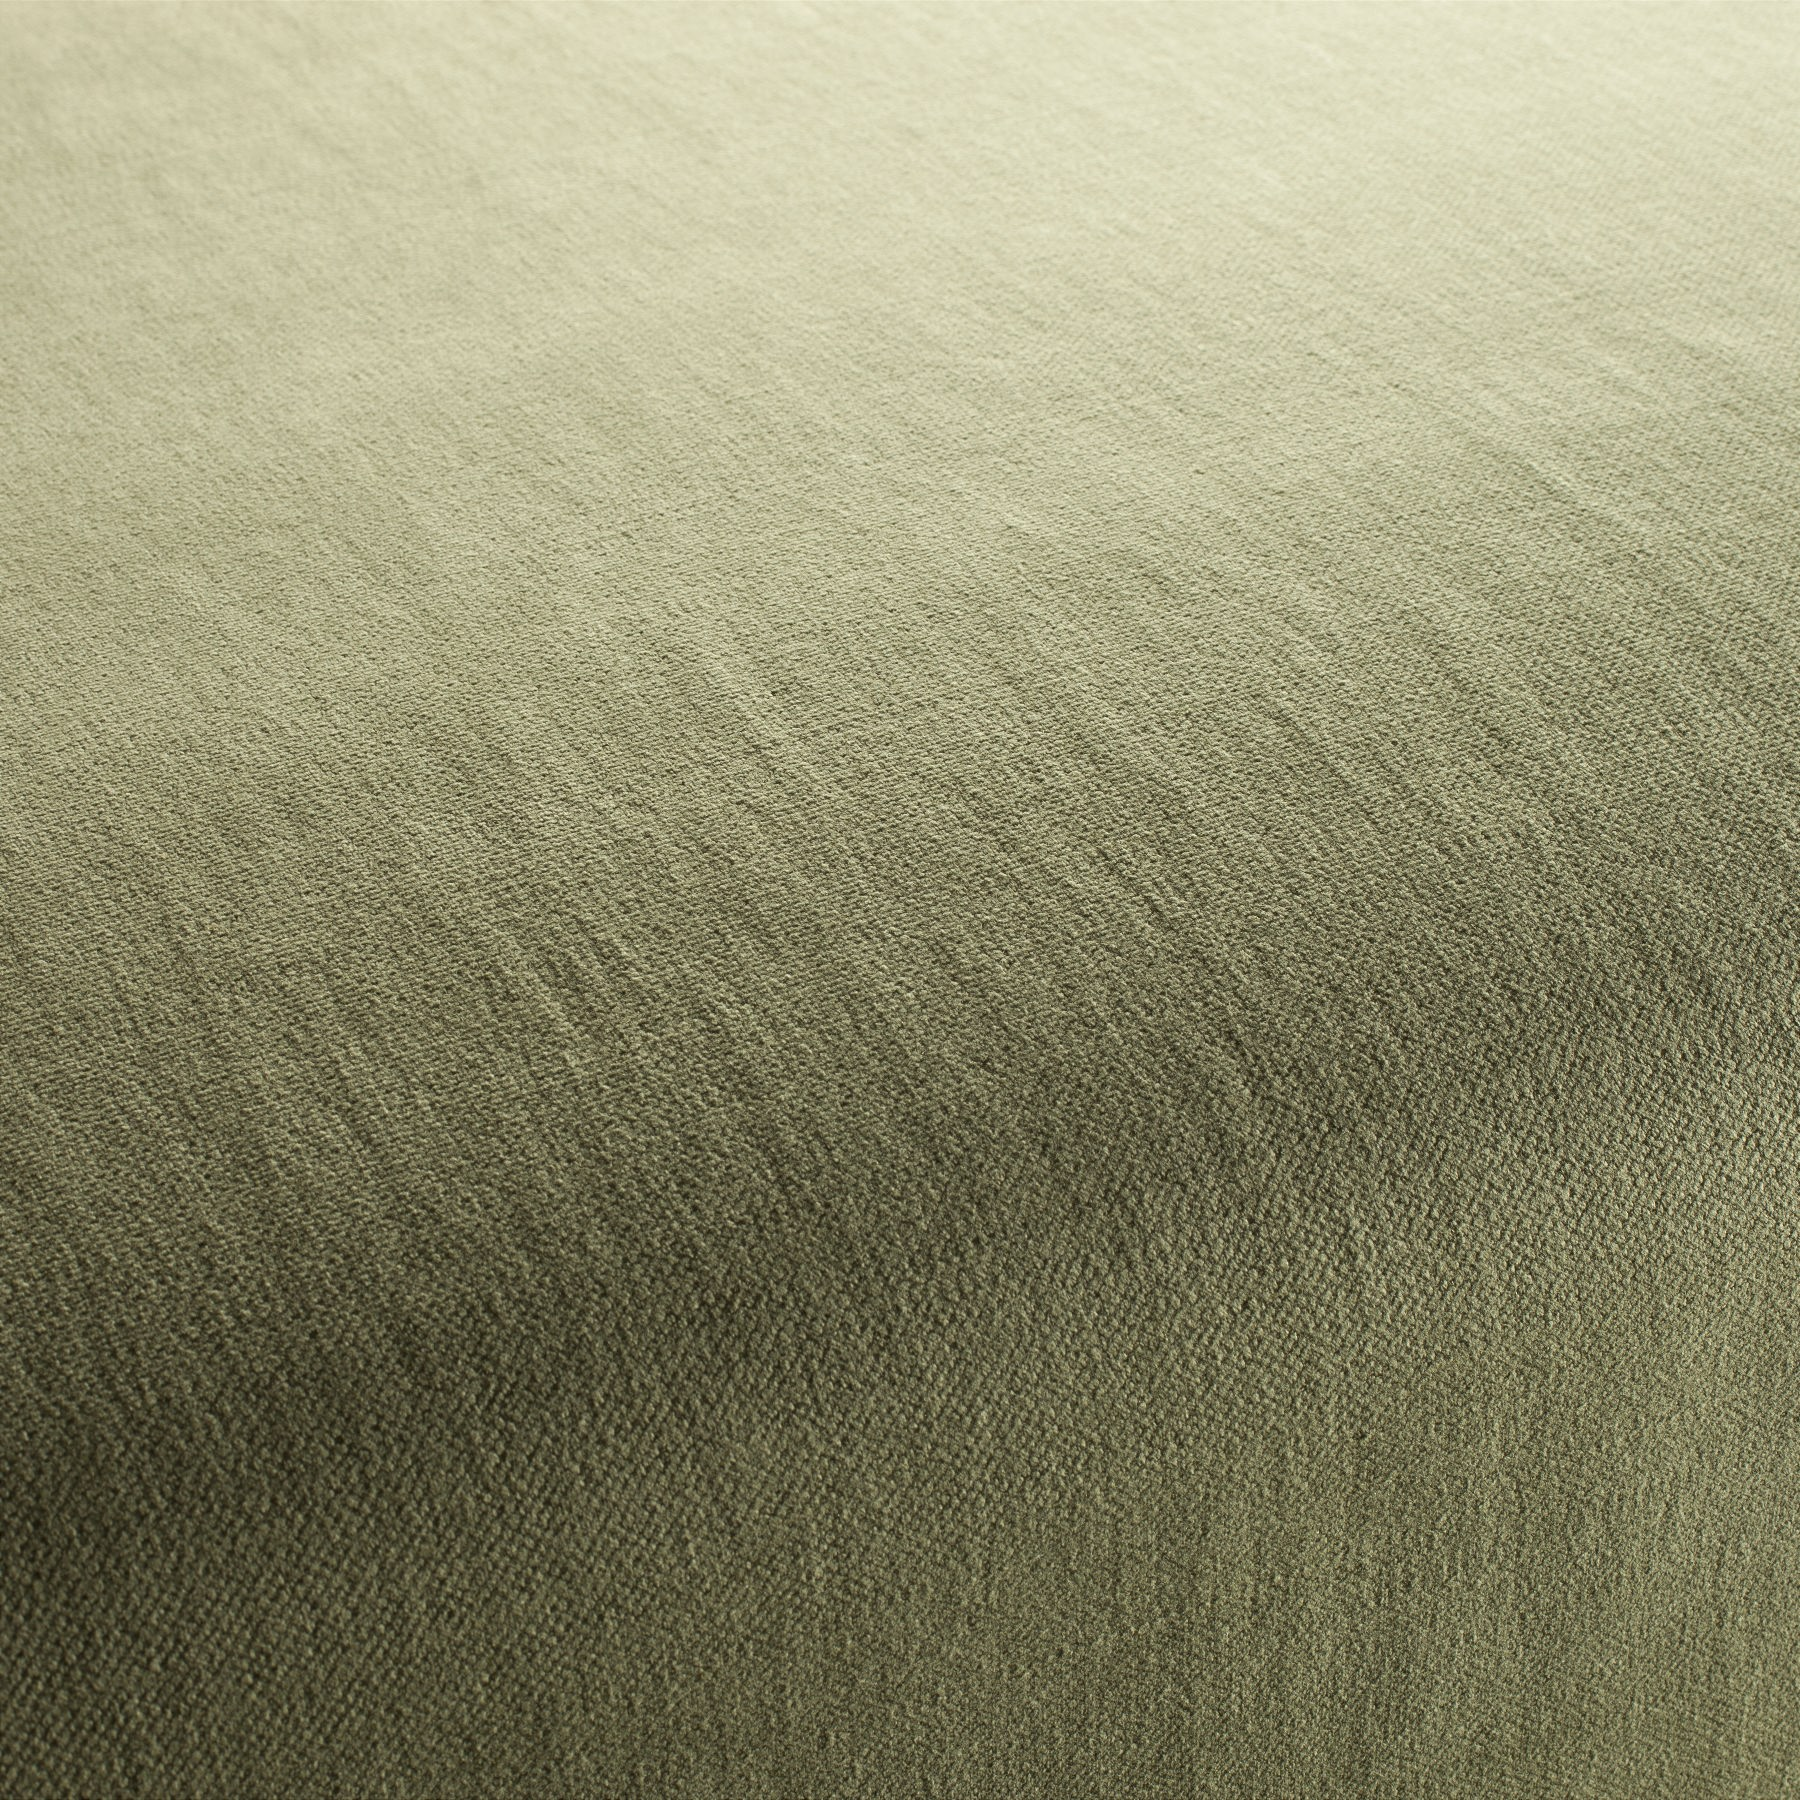 upholstery fabric hot madison reloaded ch1249 233 jab anstoetz. Black Bedroom Furniture Sets. Home Design Ideas